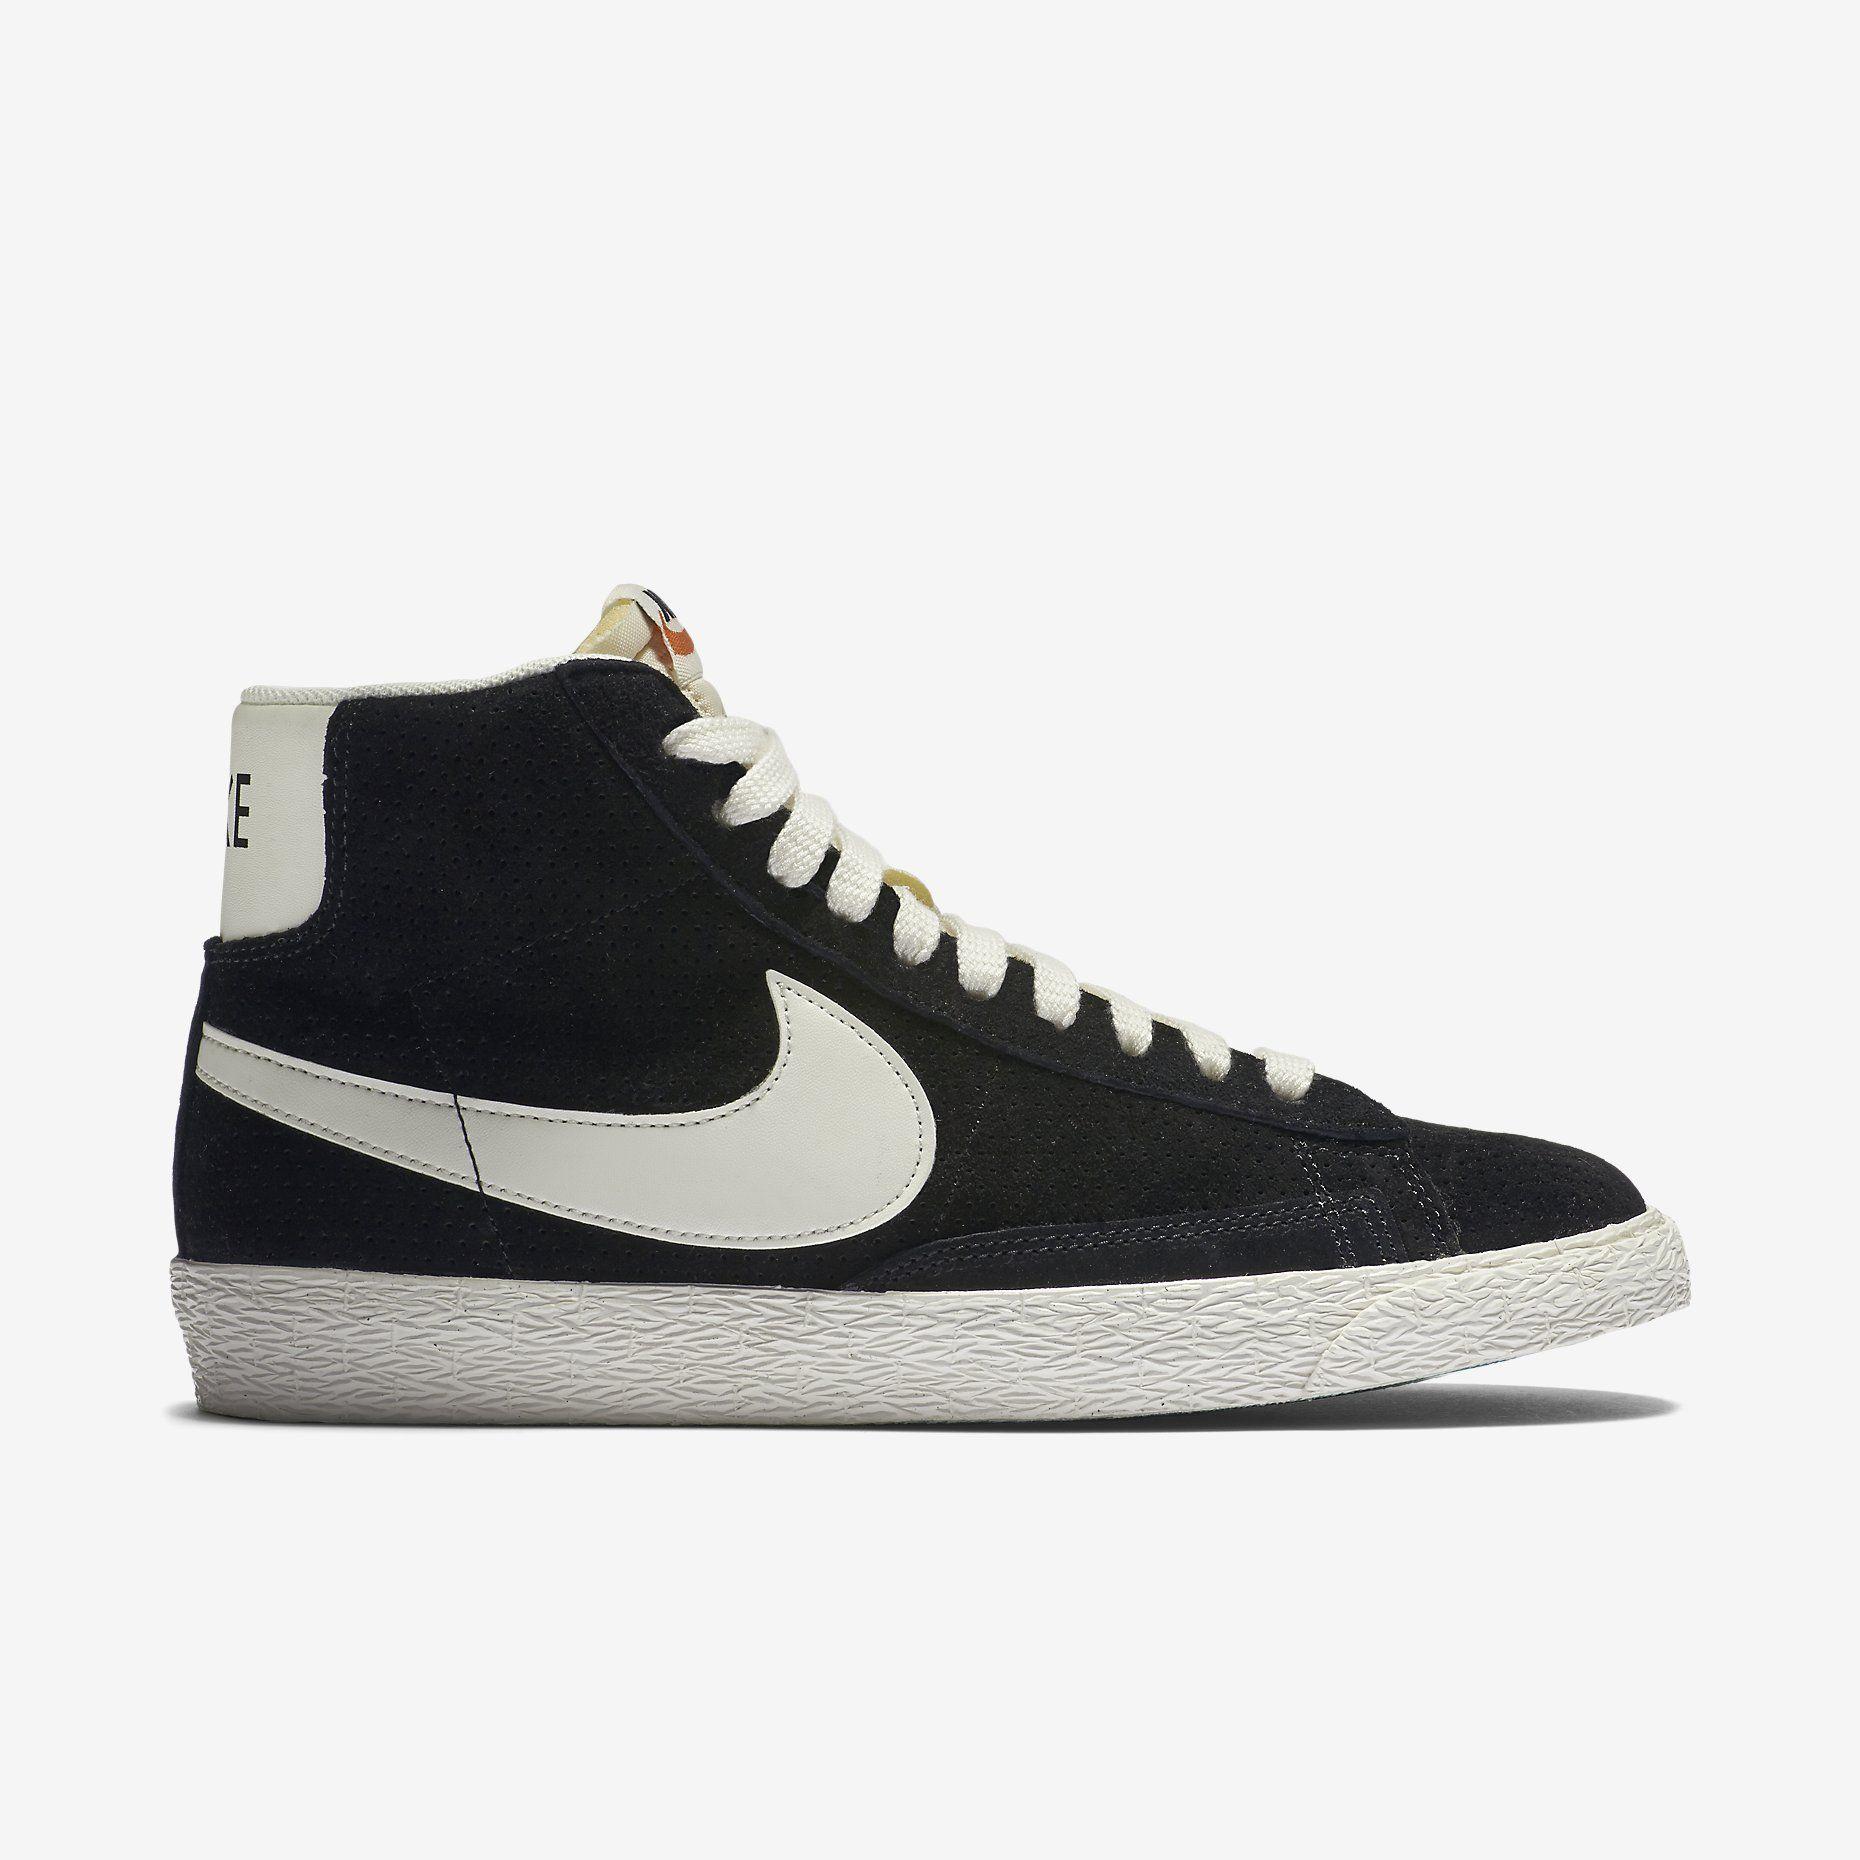 corona Días laborables invención  Nike Blazer Mid Suede Vintage Women's Shoe. Nike Store | Nike blazer, Nike,  Nike store